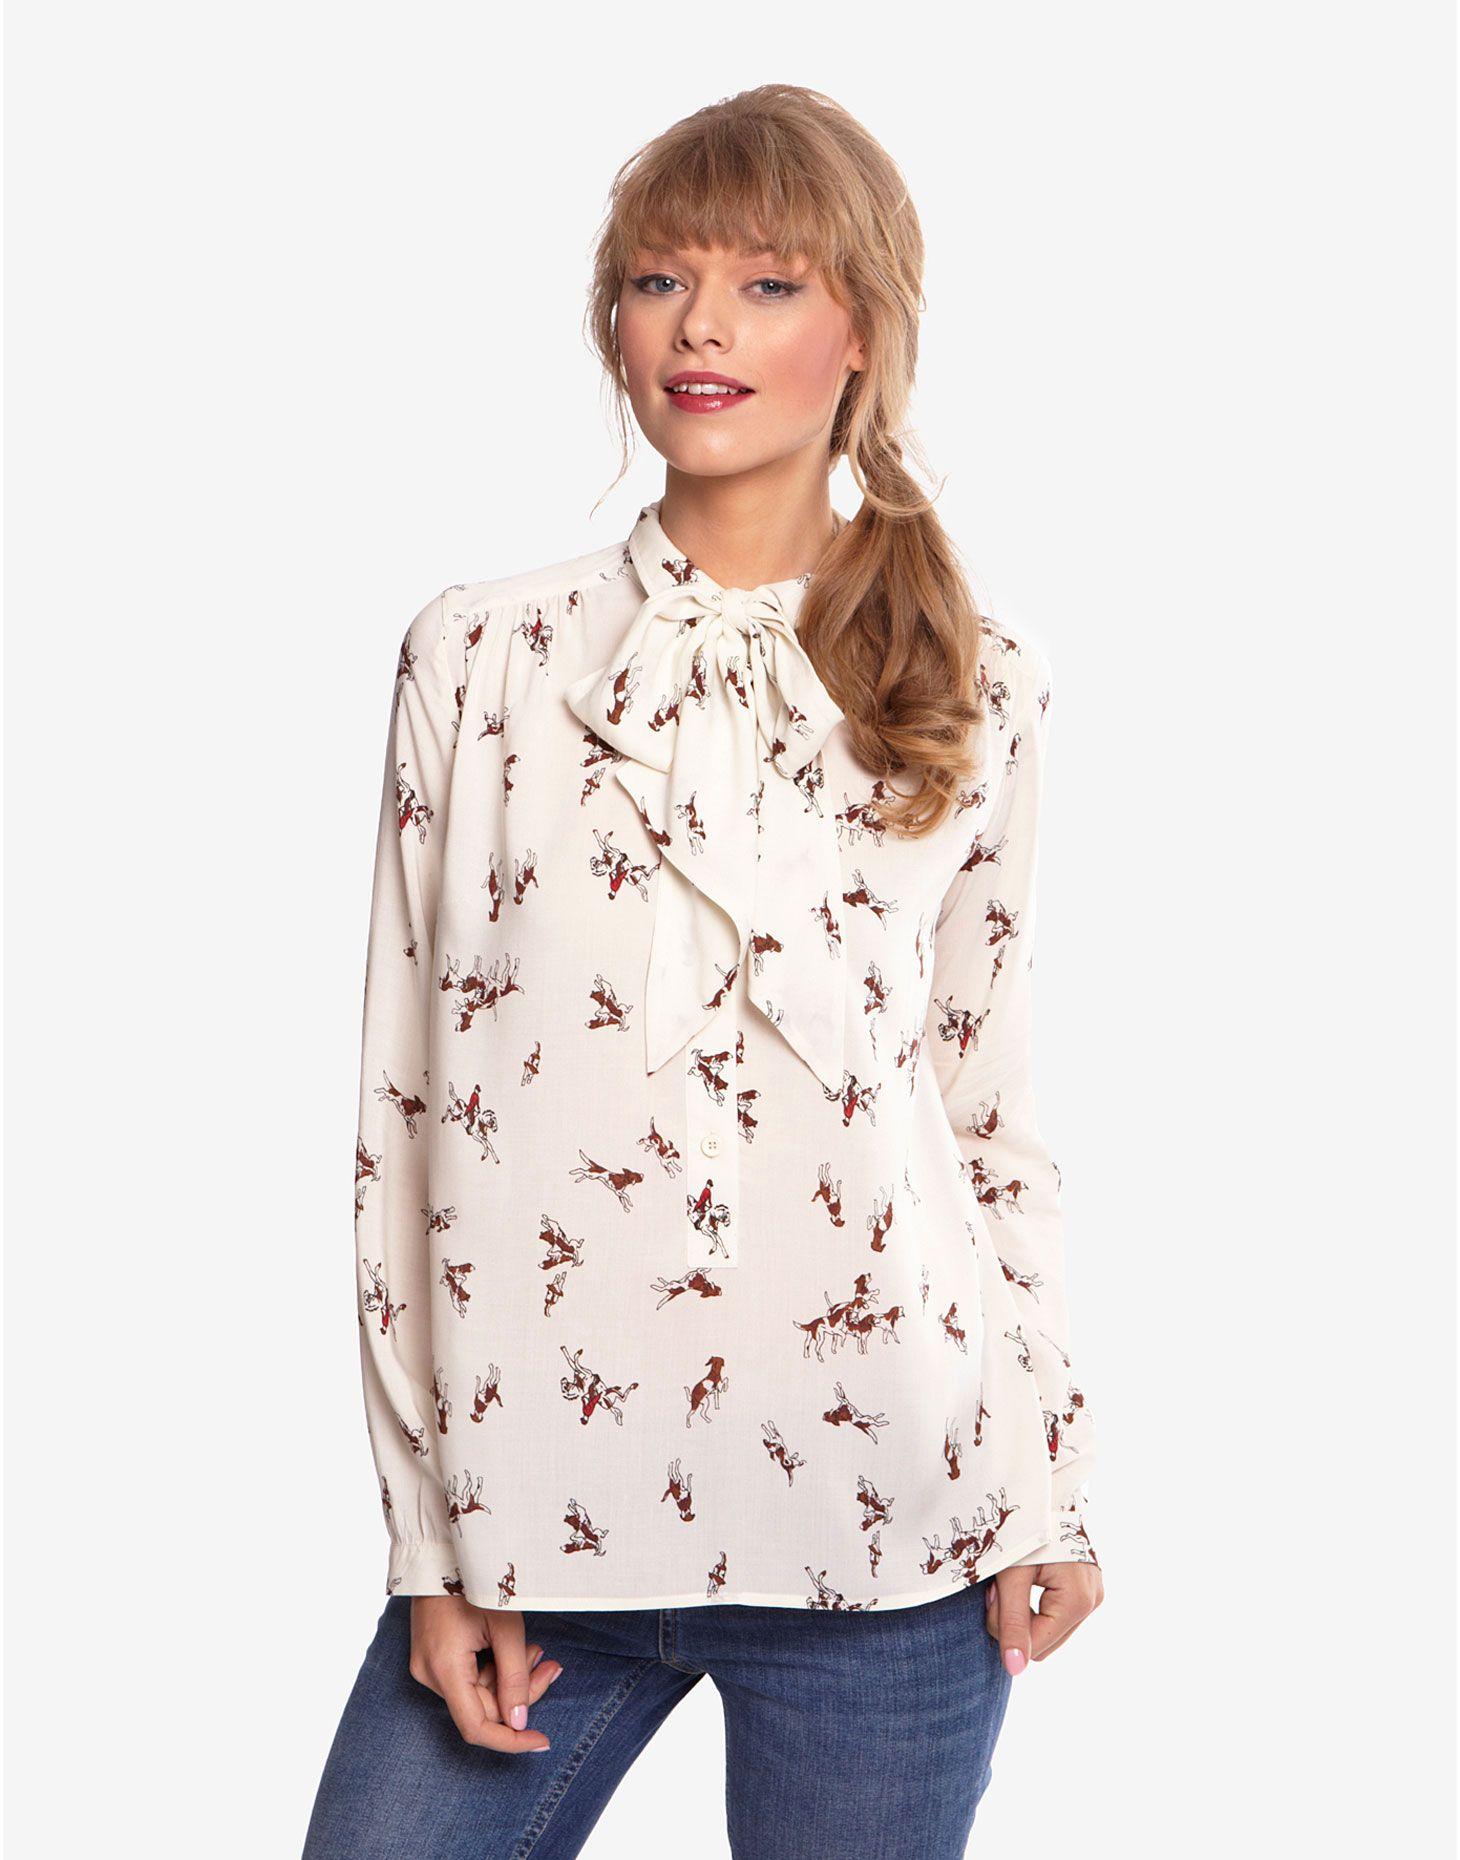 cbe9e224 SHORLEY Womens Printed Blouse. SHORLEY Womens Printed Blouse Bow Shirts ...